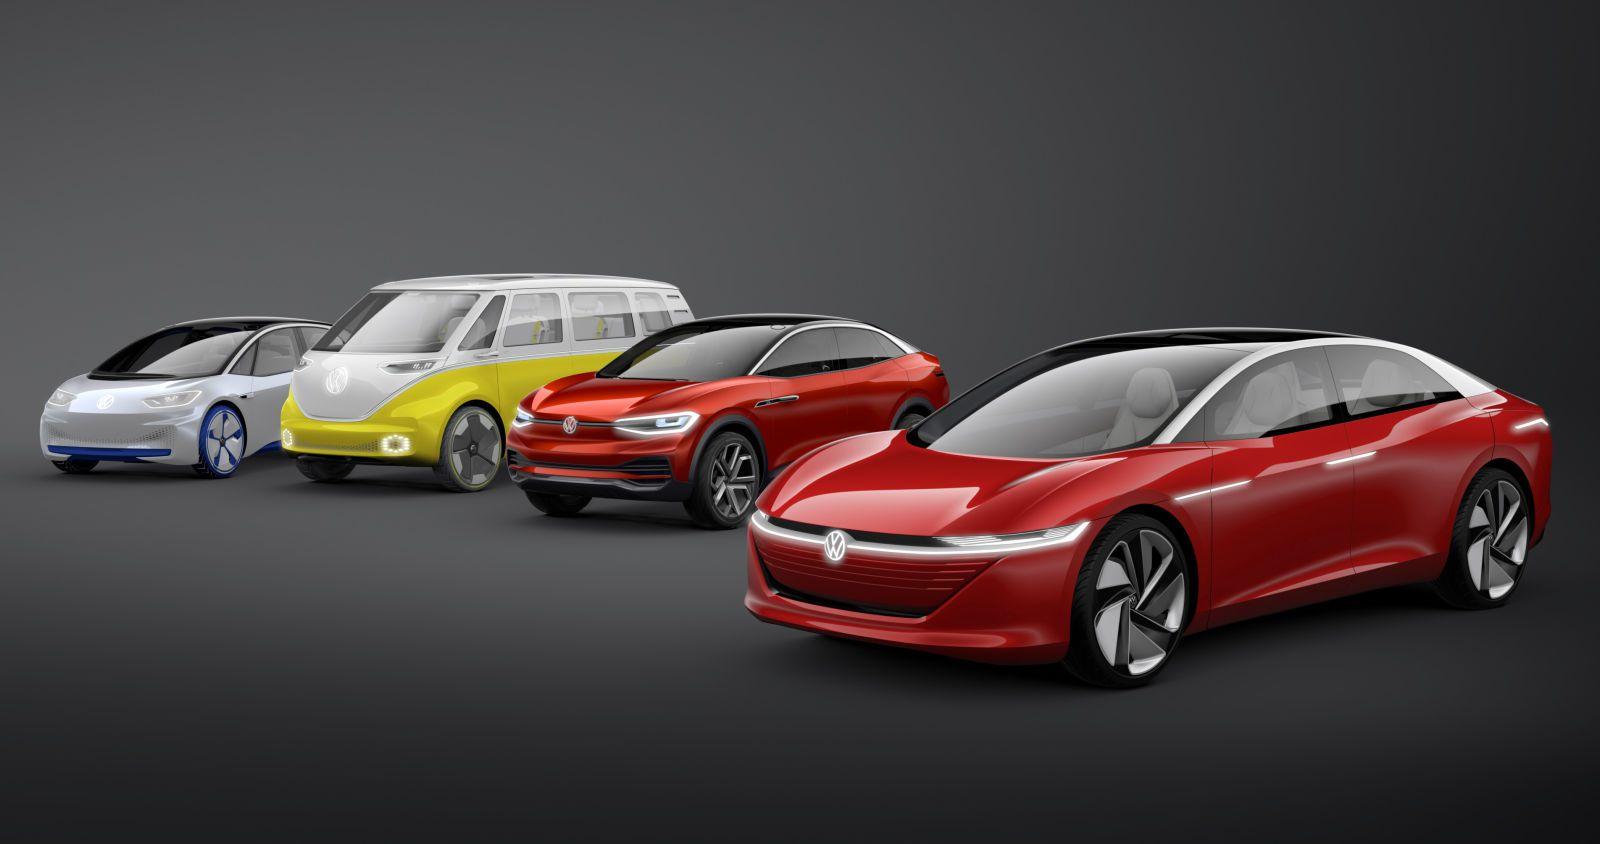 designs of cars